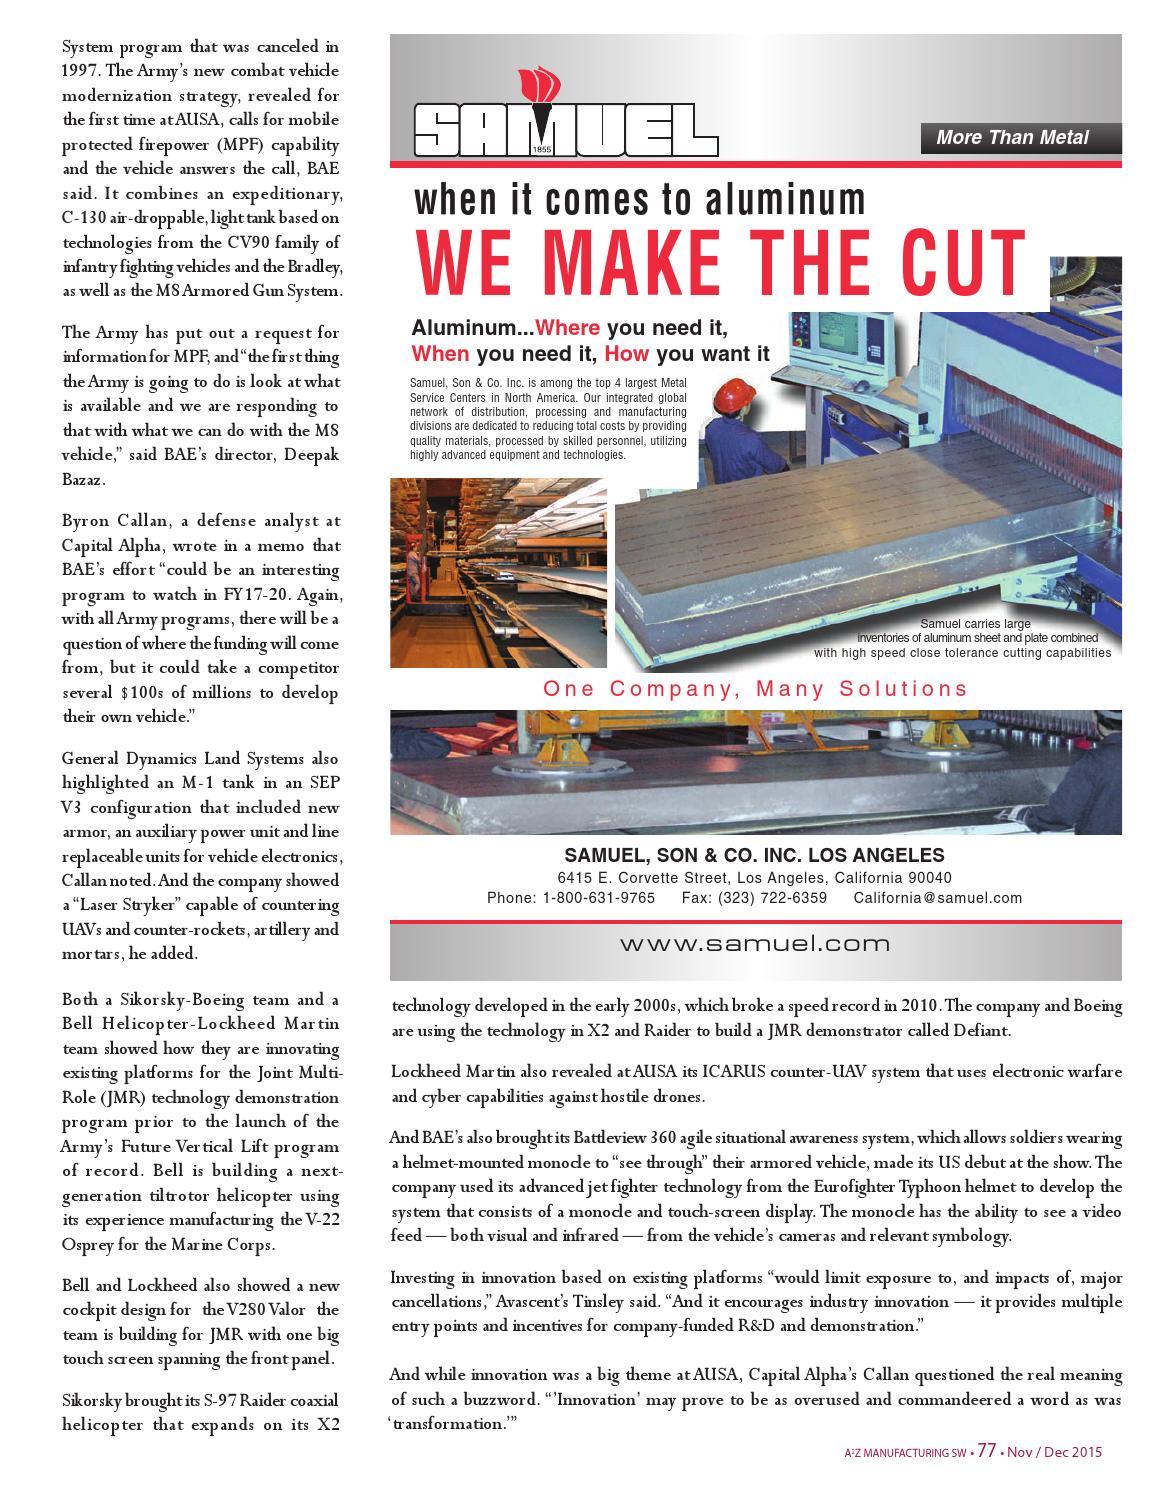 A2Z Mfg Magazine SW Nov 2015 by A2Z Manufacturing Magazines - issuu